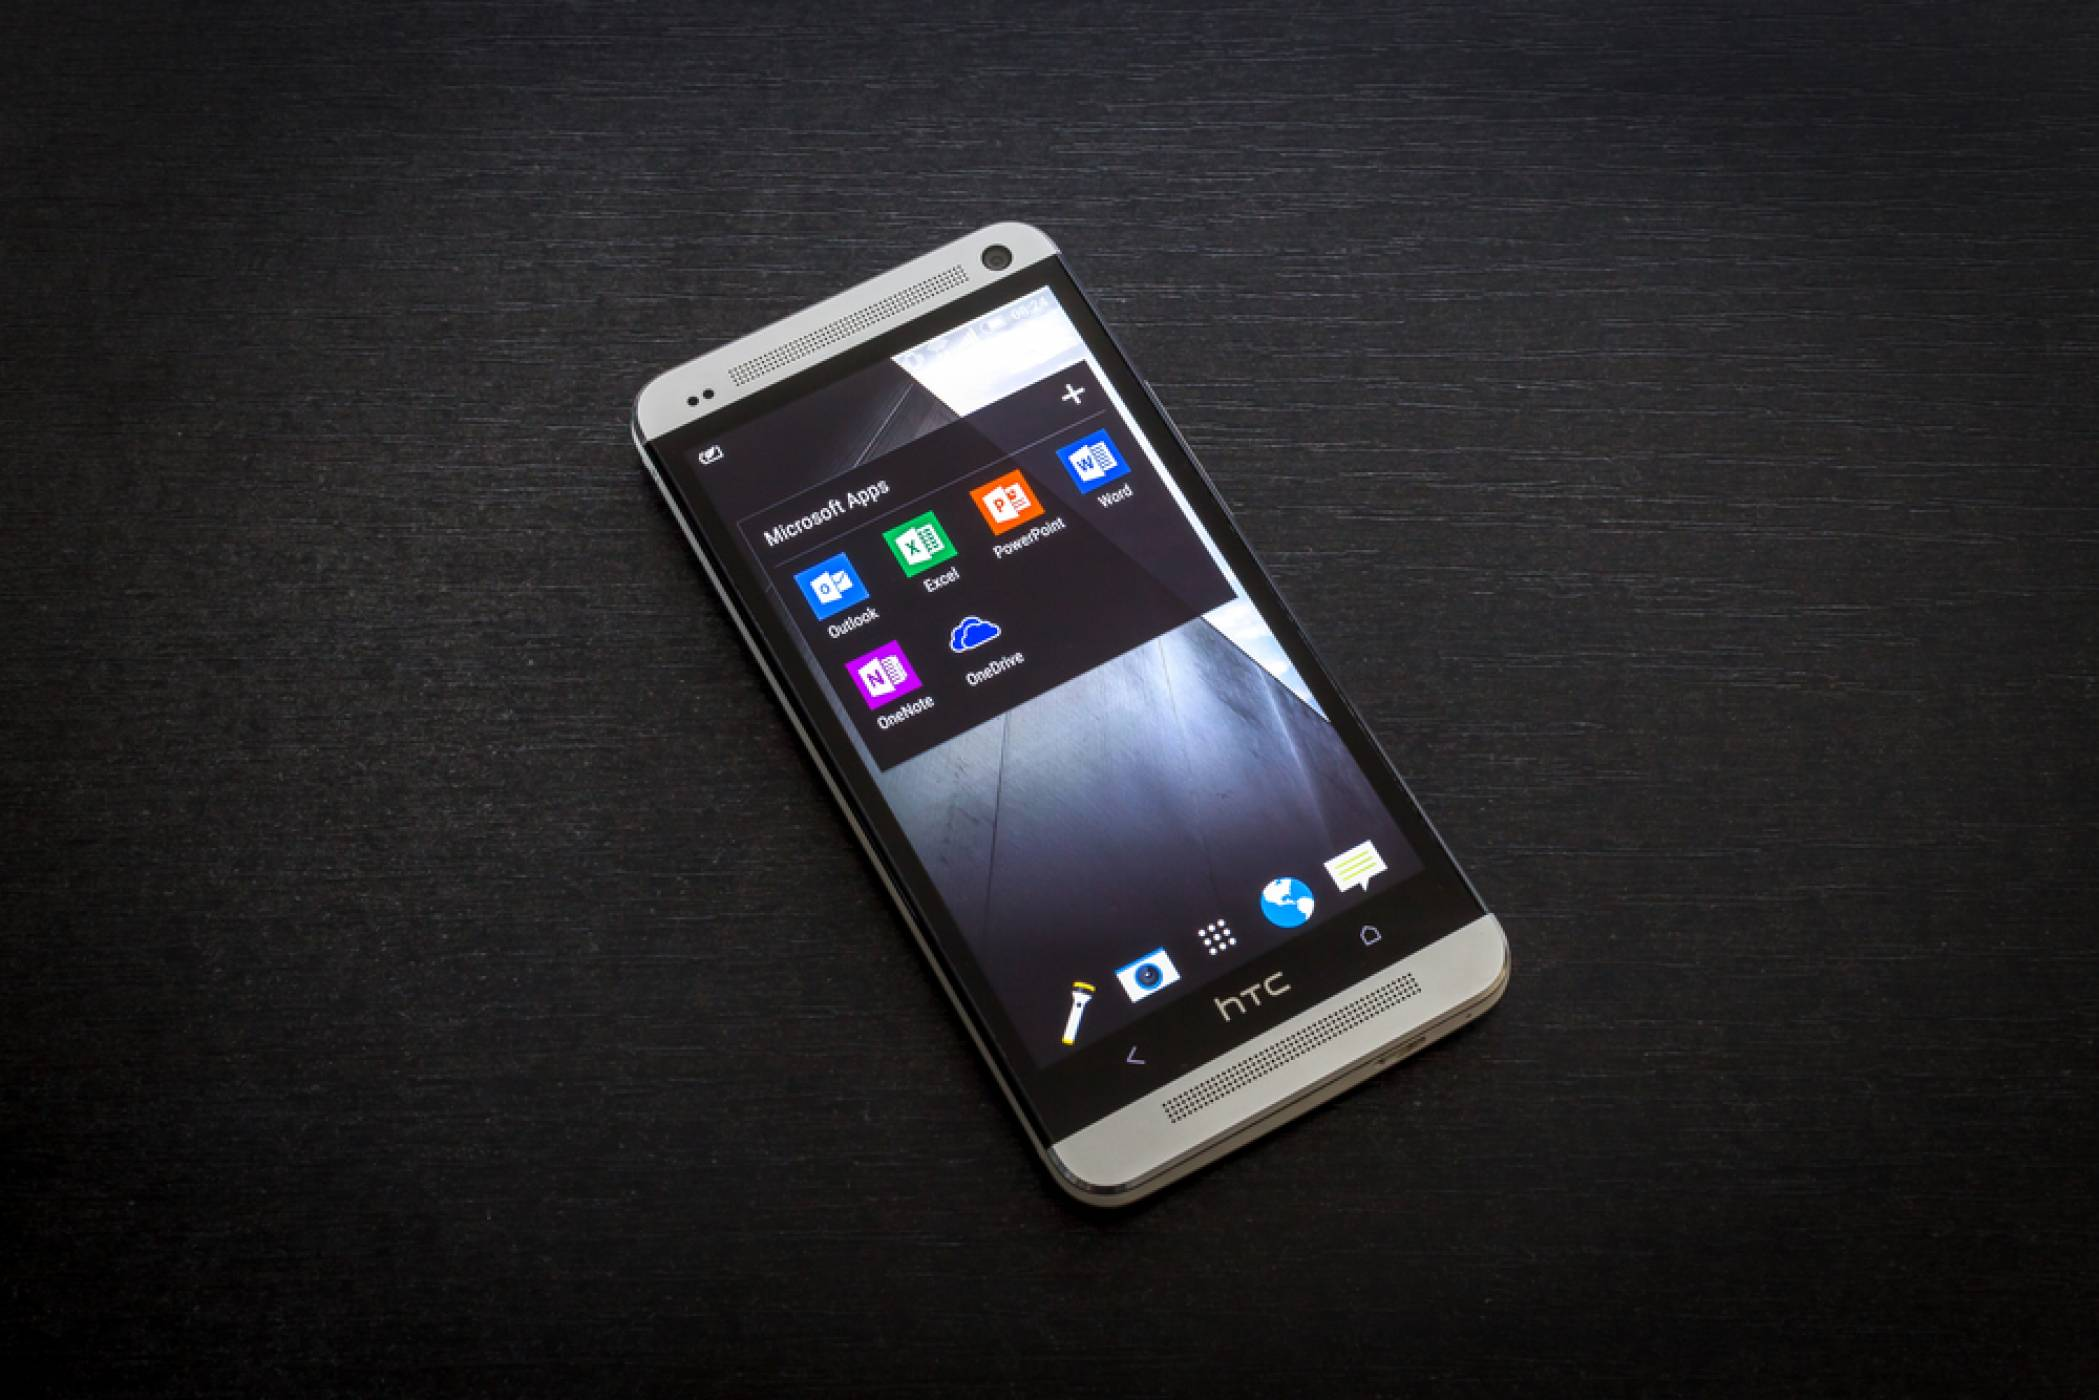 Без чудеса: приходите на HTC се сгромолясаха до рекордно ниски нива